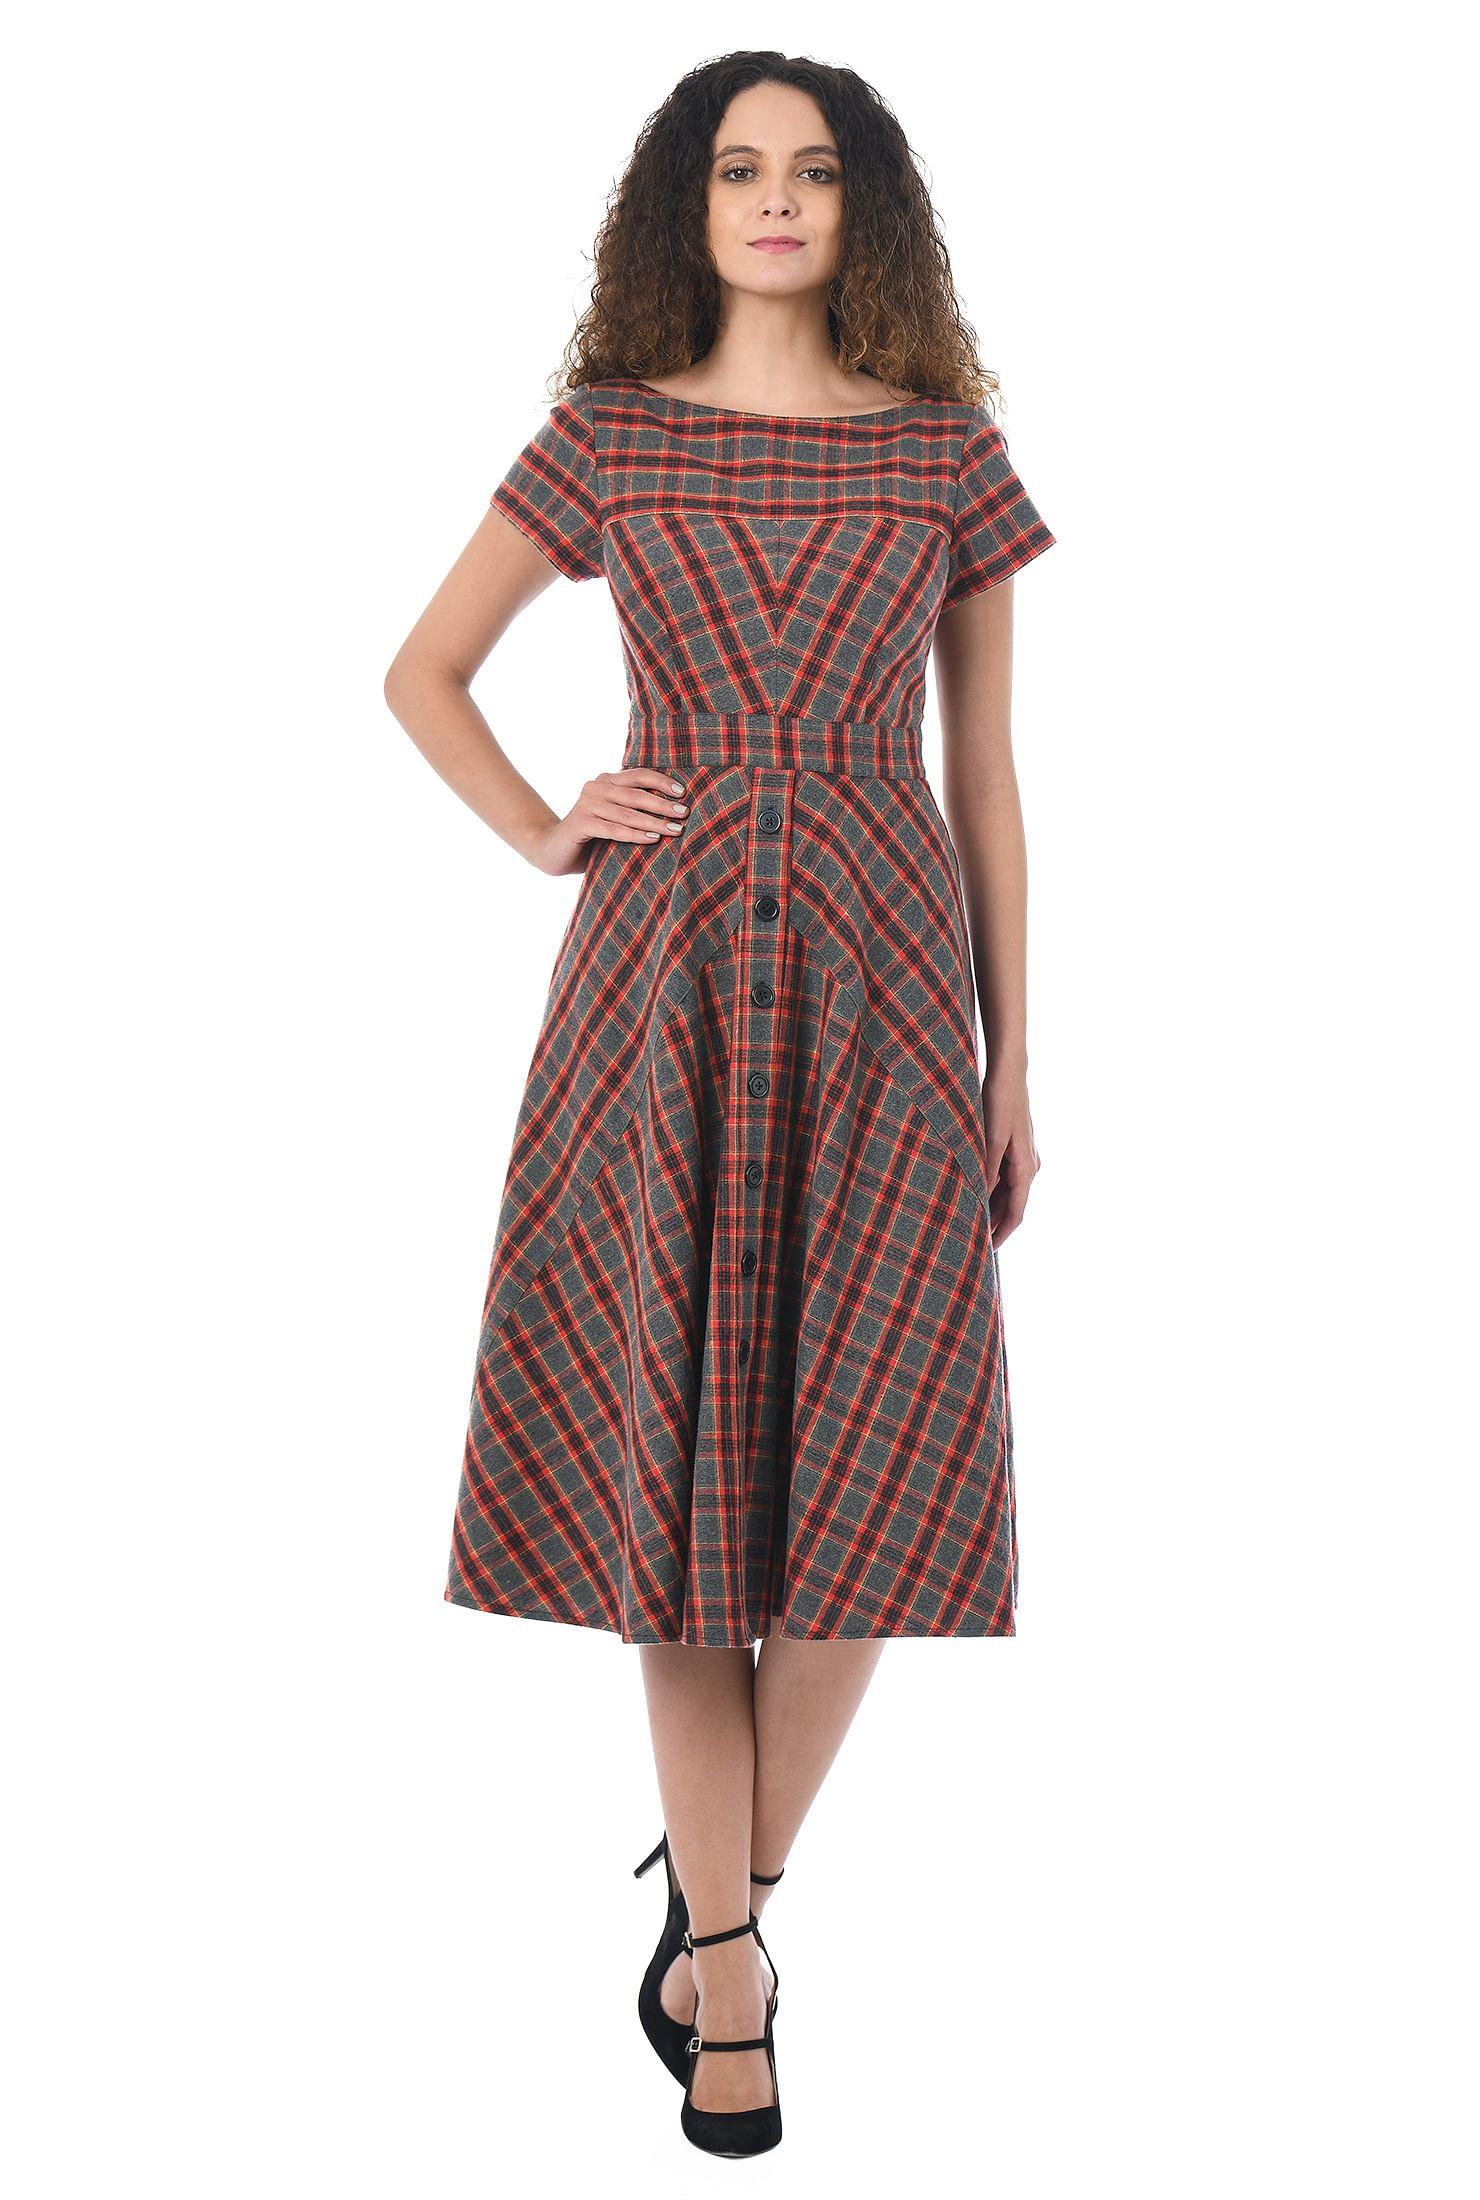 Brushed plaid faux-button front dress